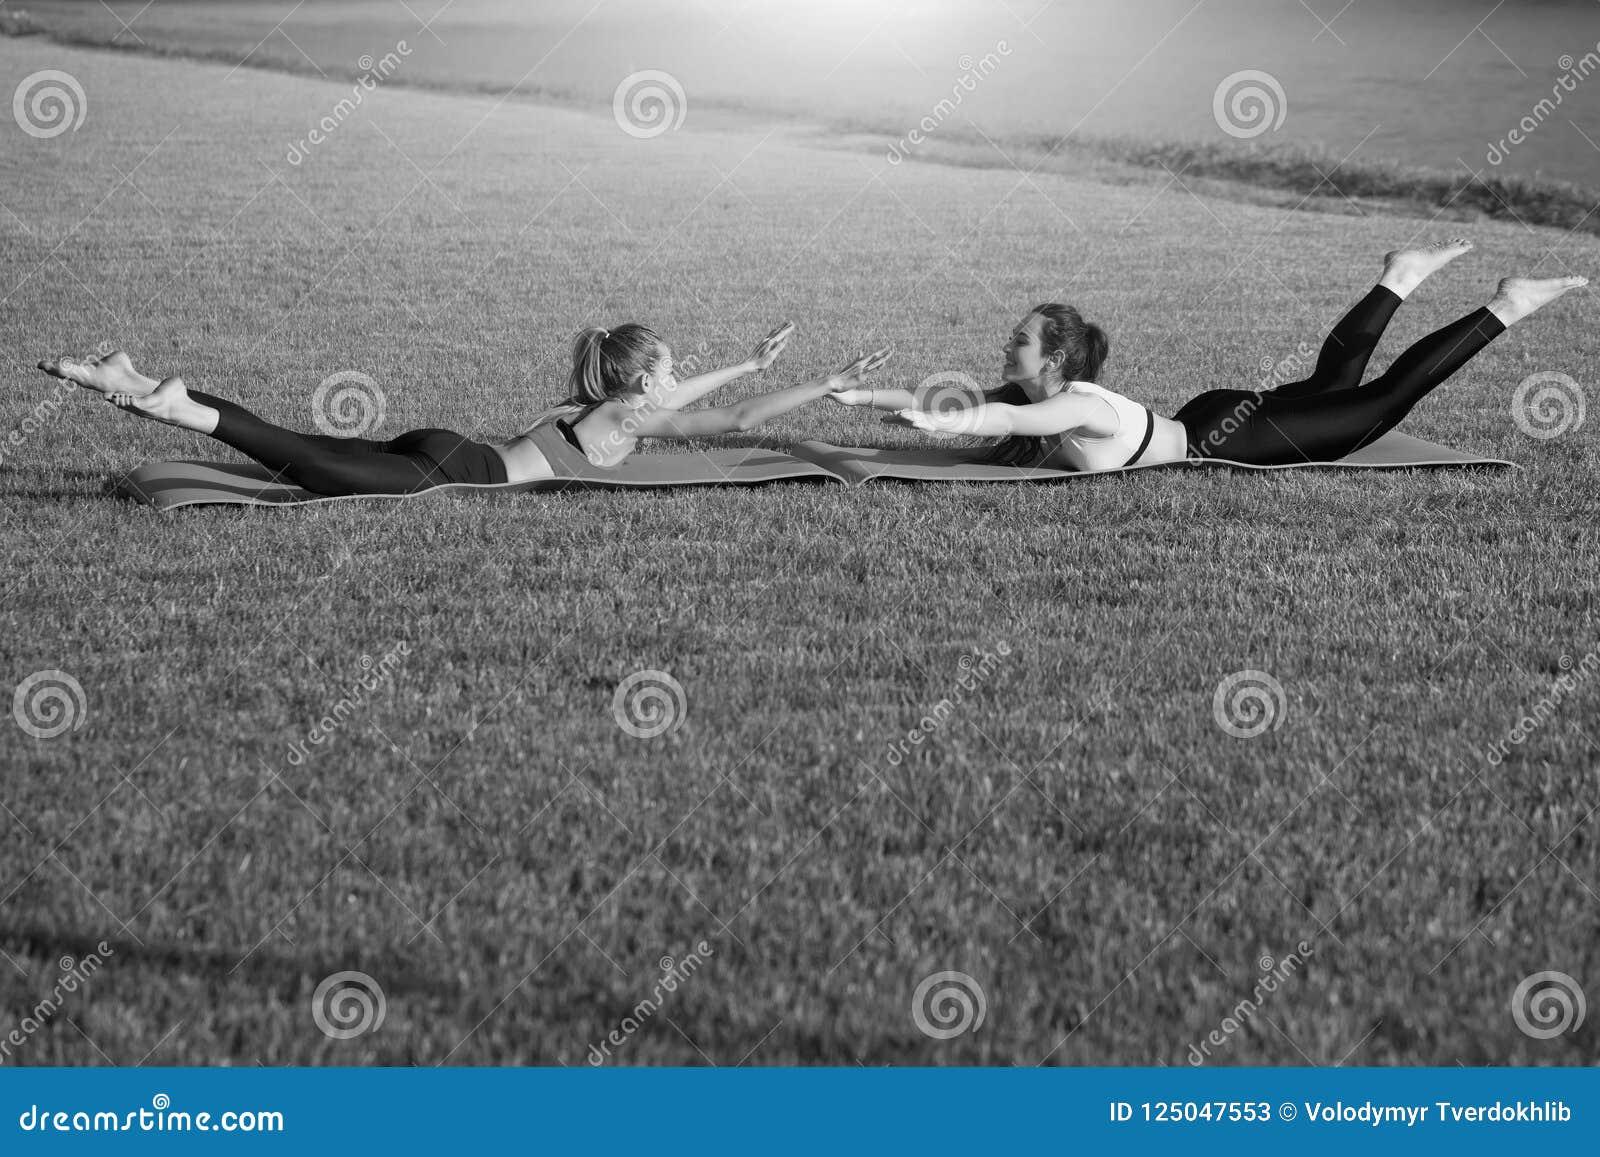 Lato energia i aktywność